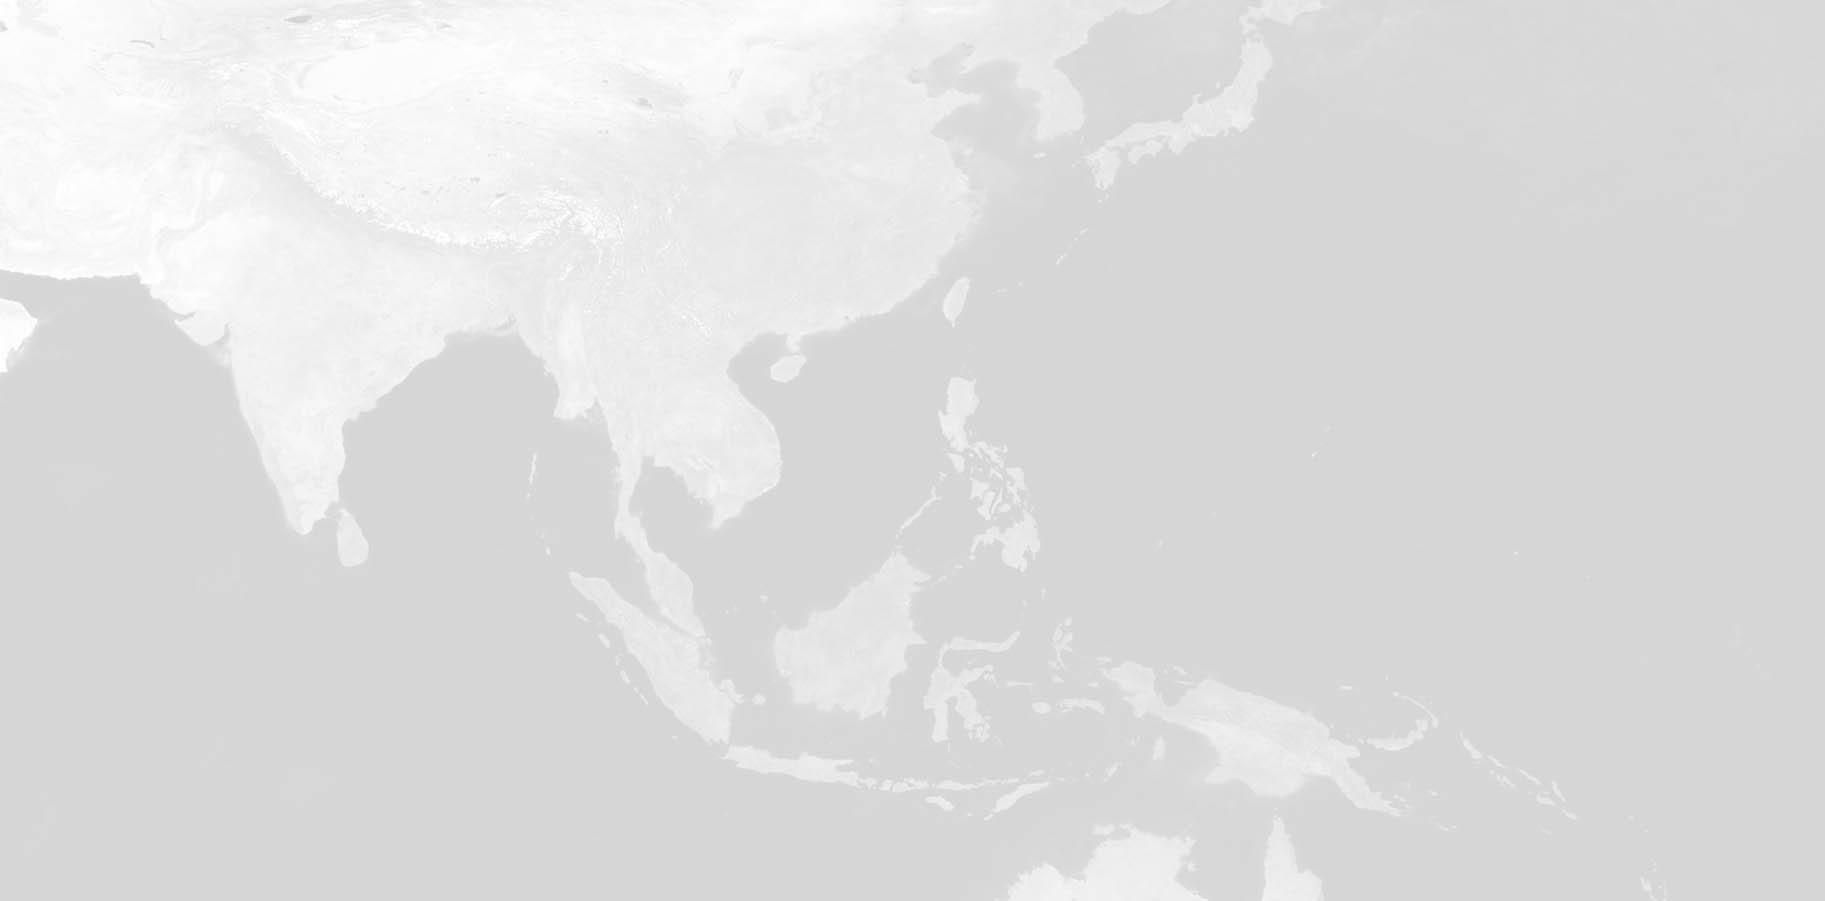 ap map grey